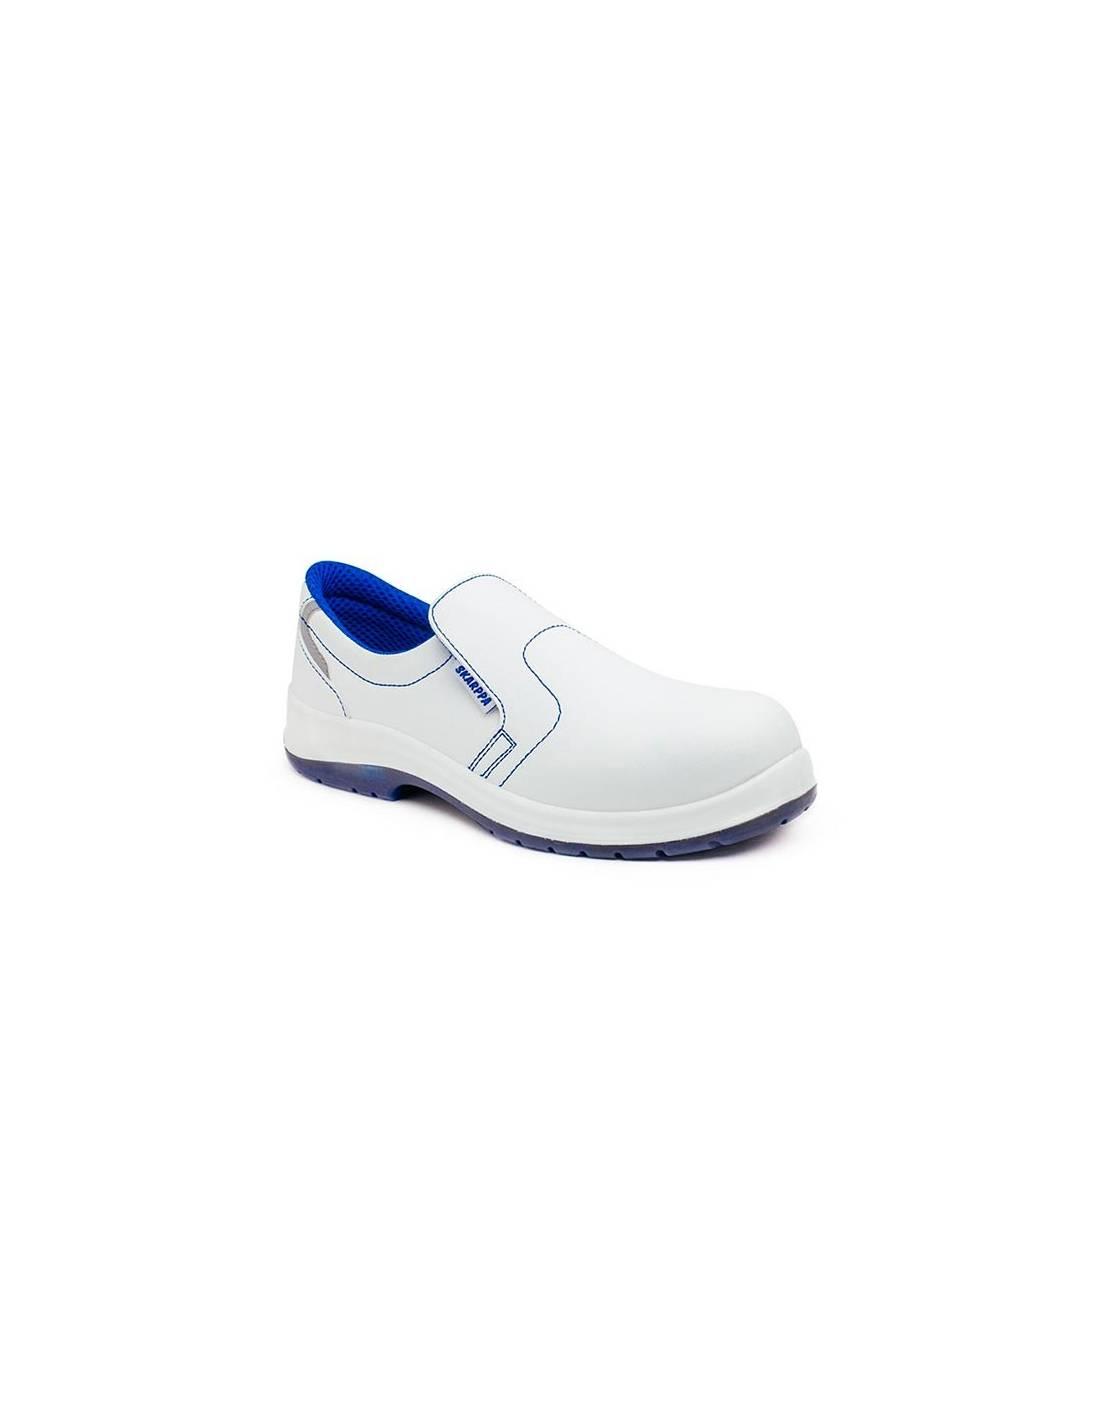 Zapato alimentación S2+SRC+CI (42) OdPrm3q